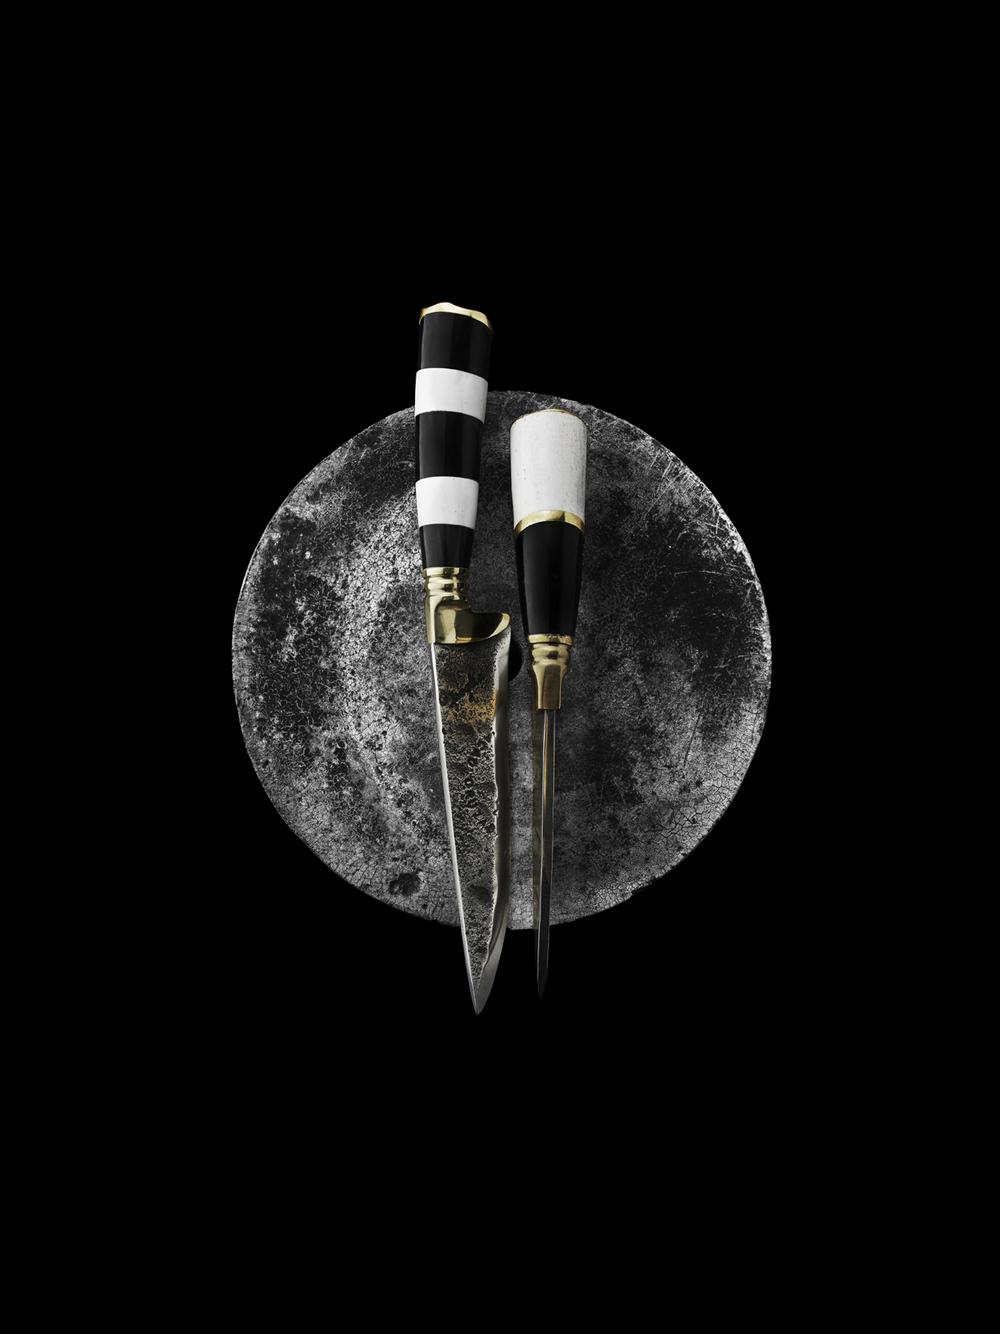 Poglia+Handcrafted+Knives.jpg